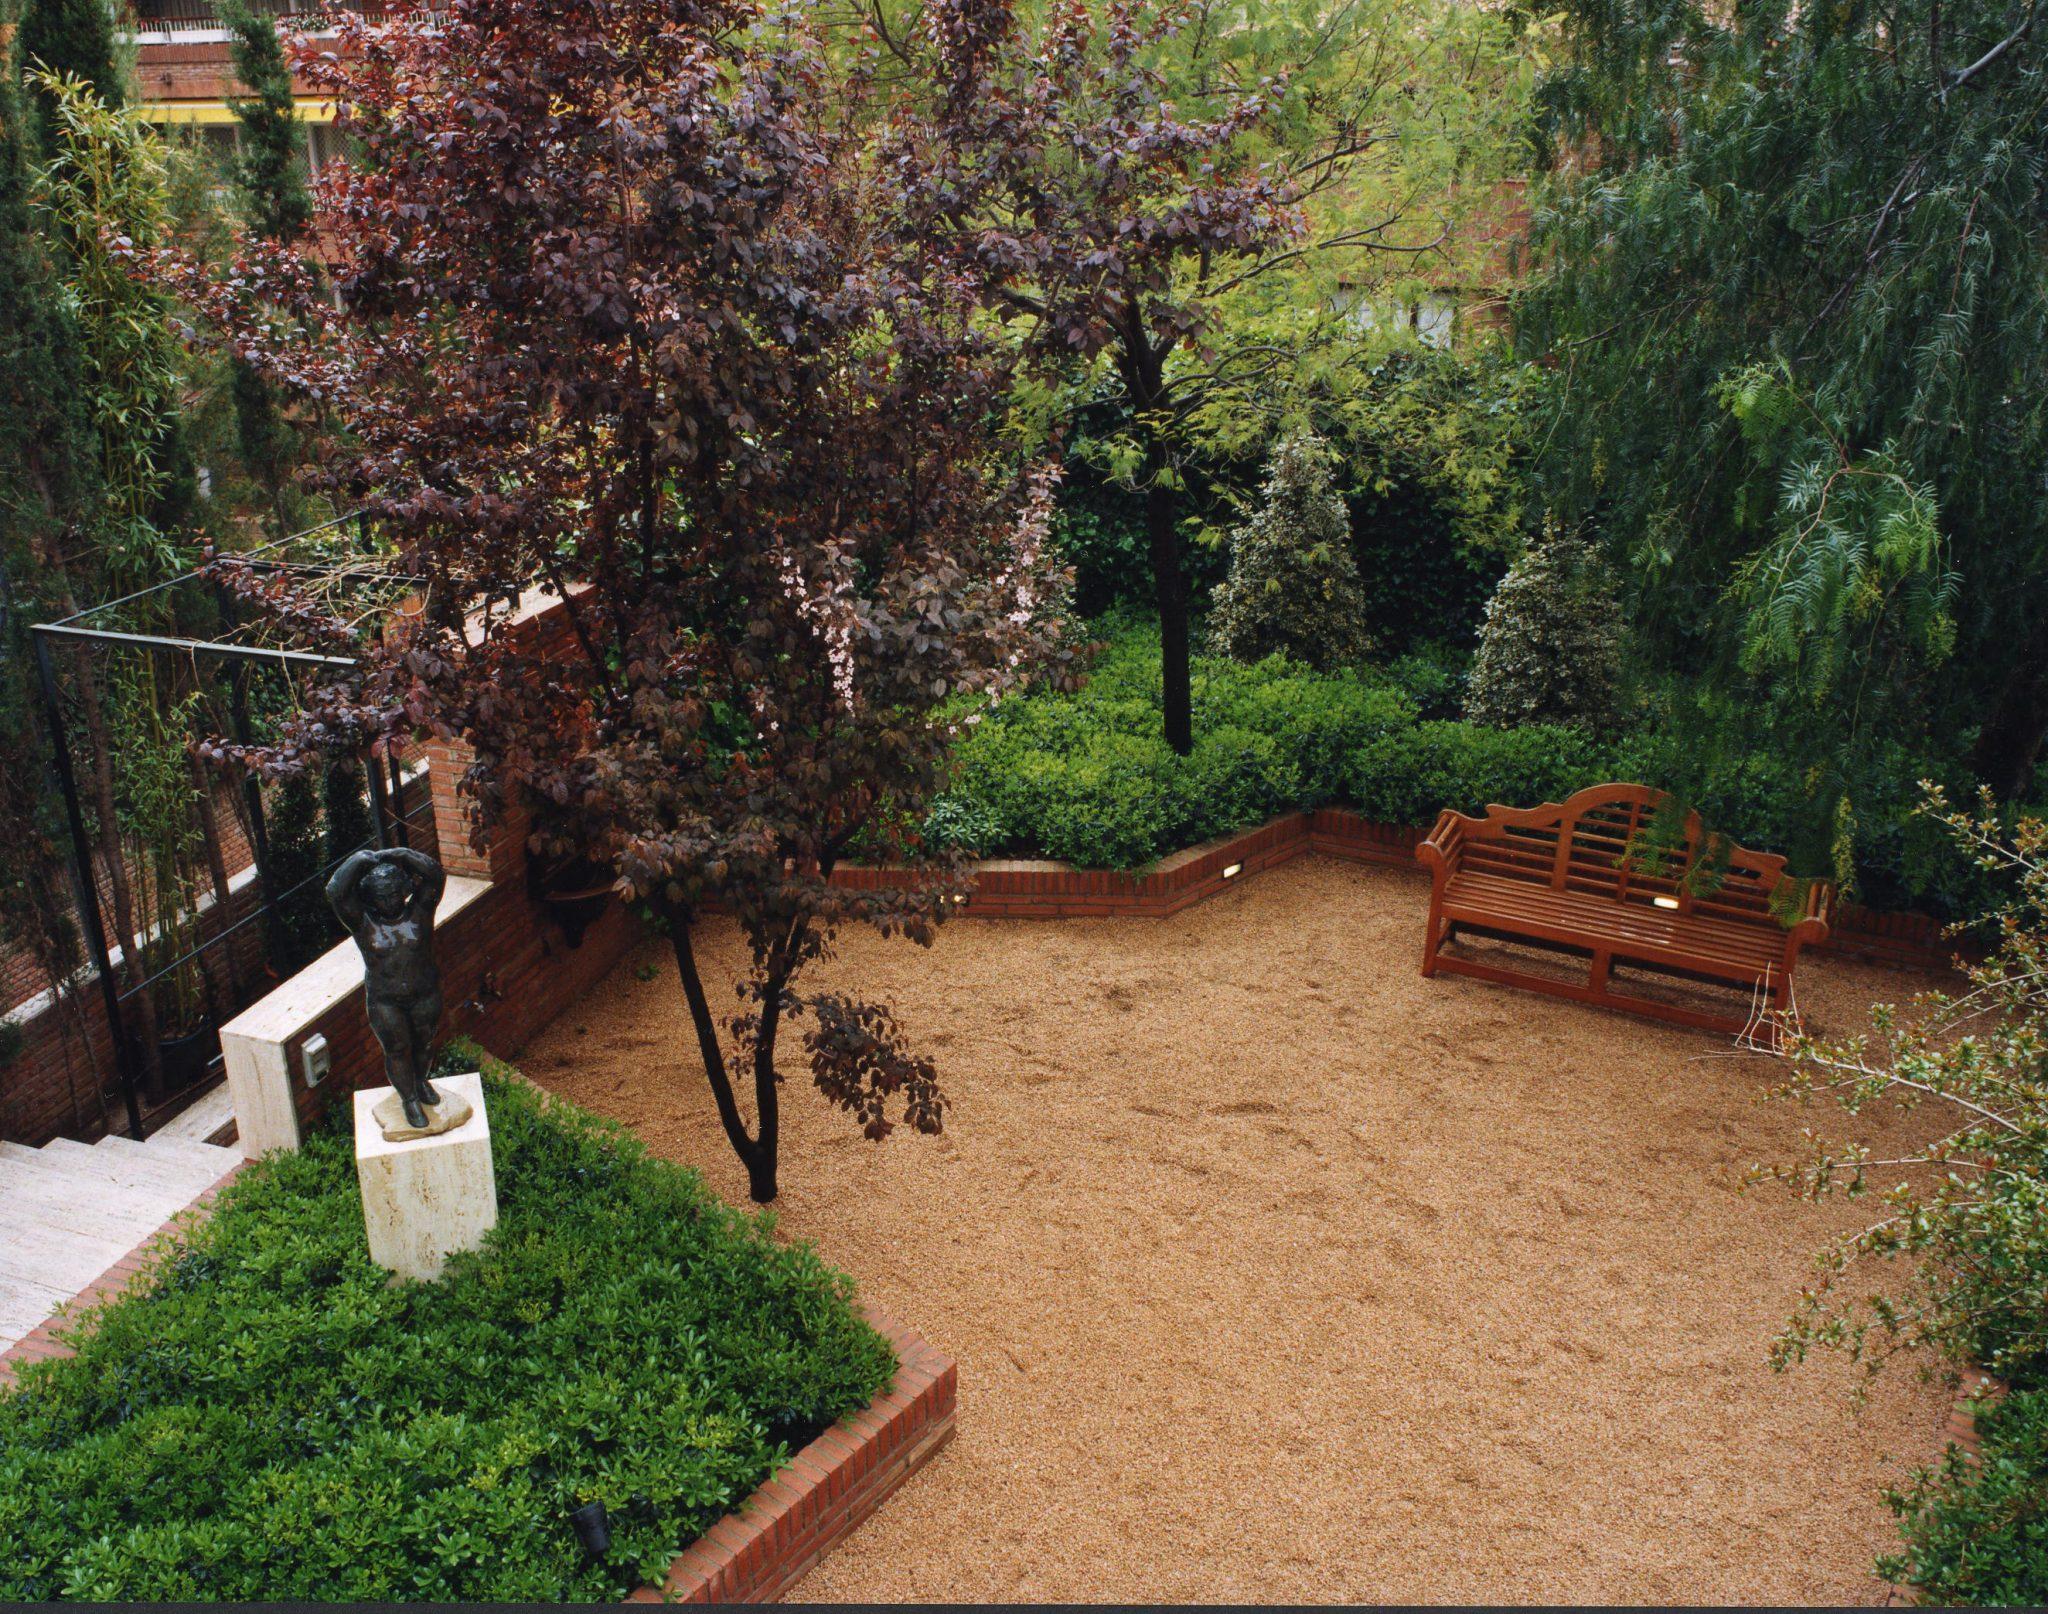 Jardineria en barcelona with jardineria en barcelona for Jardineria moral barcelona